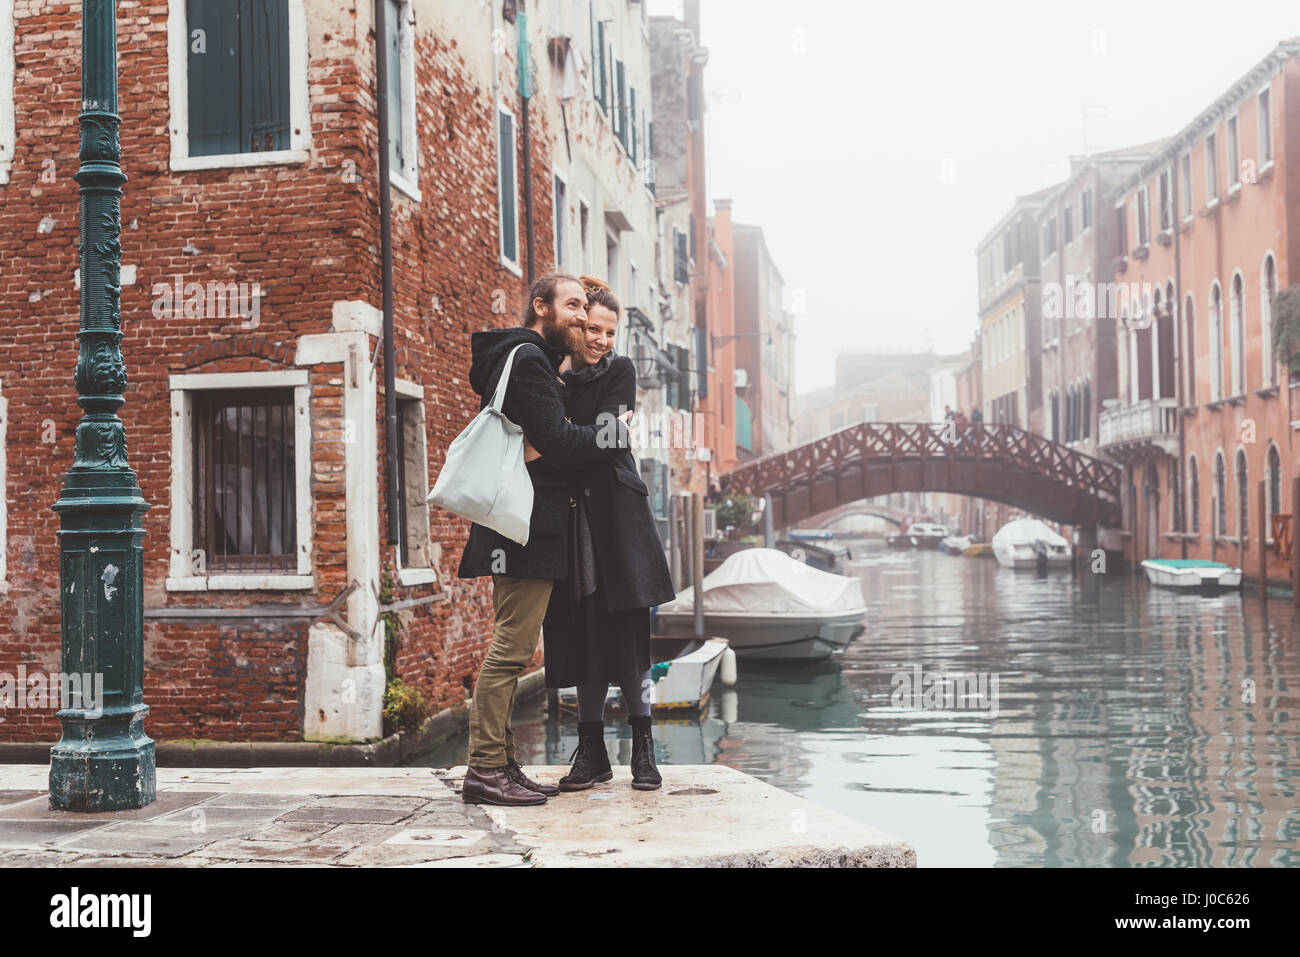 Par abrazar a Misty canal Waterfront, Venecia, Italia Imagen De Stock